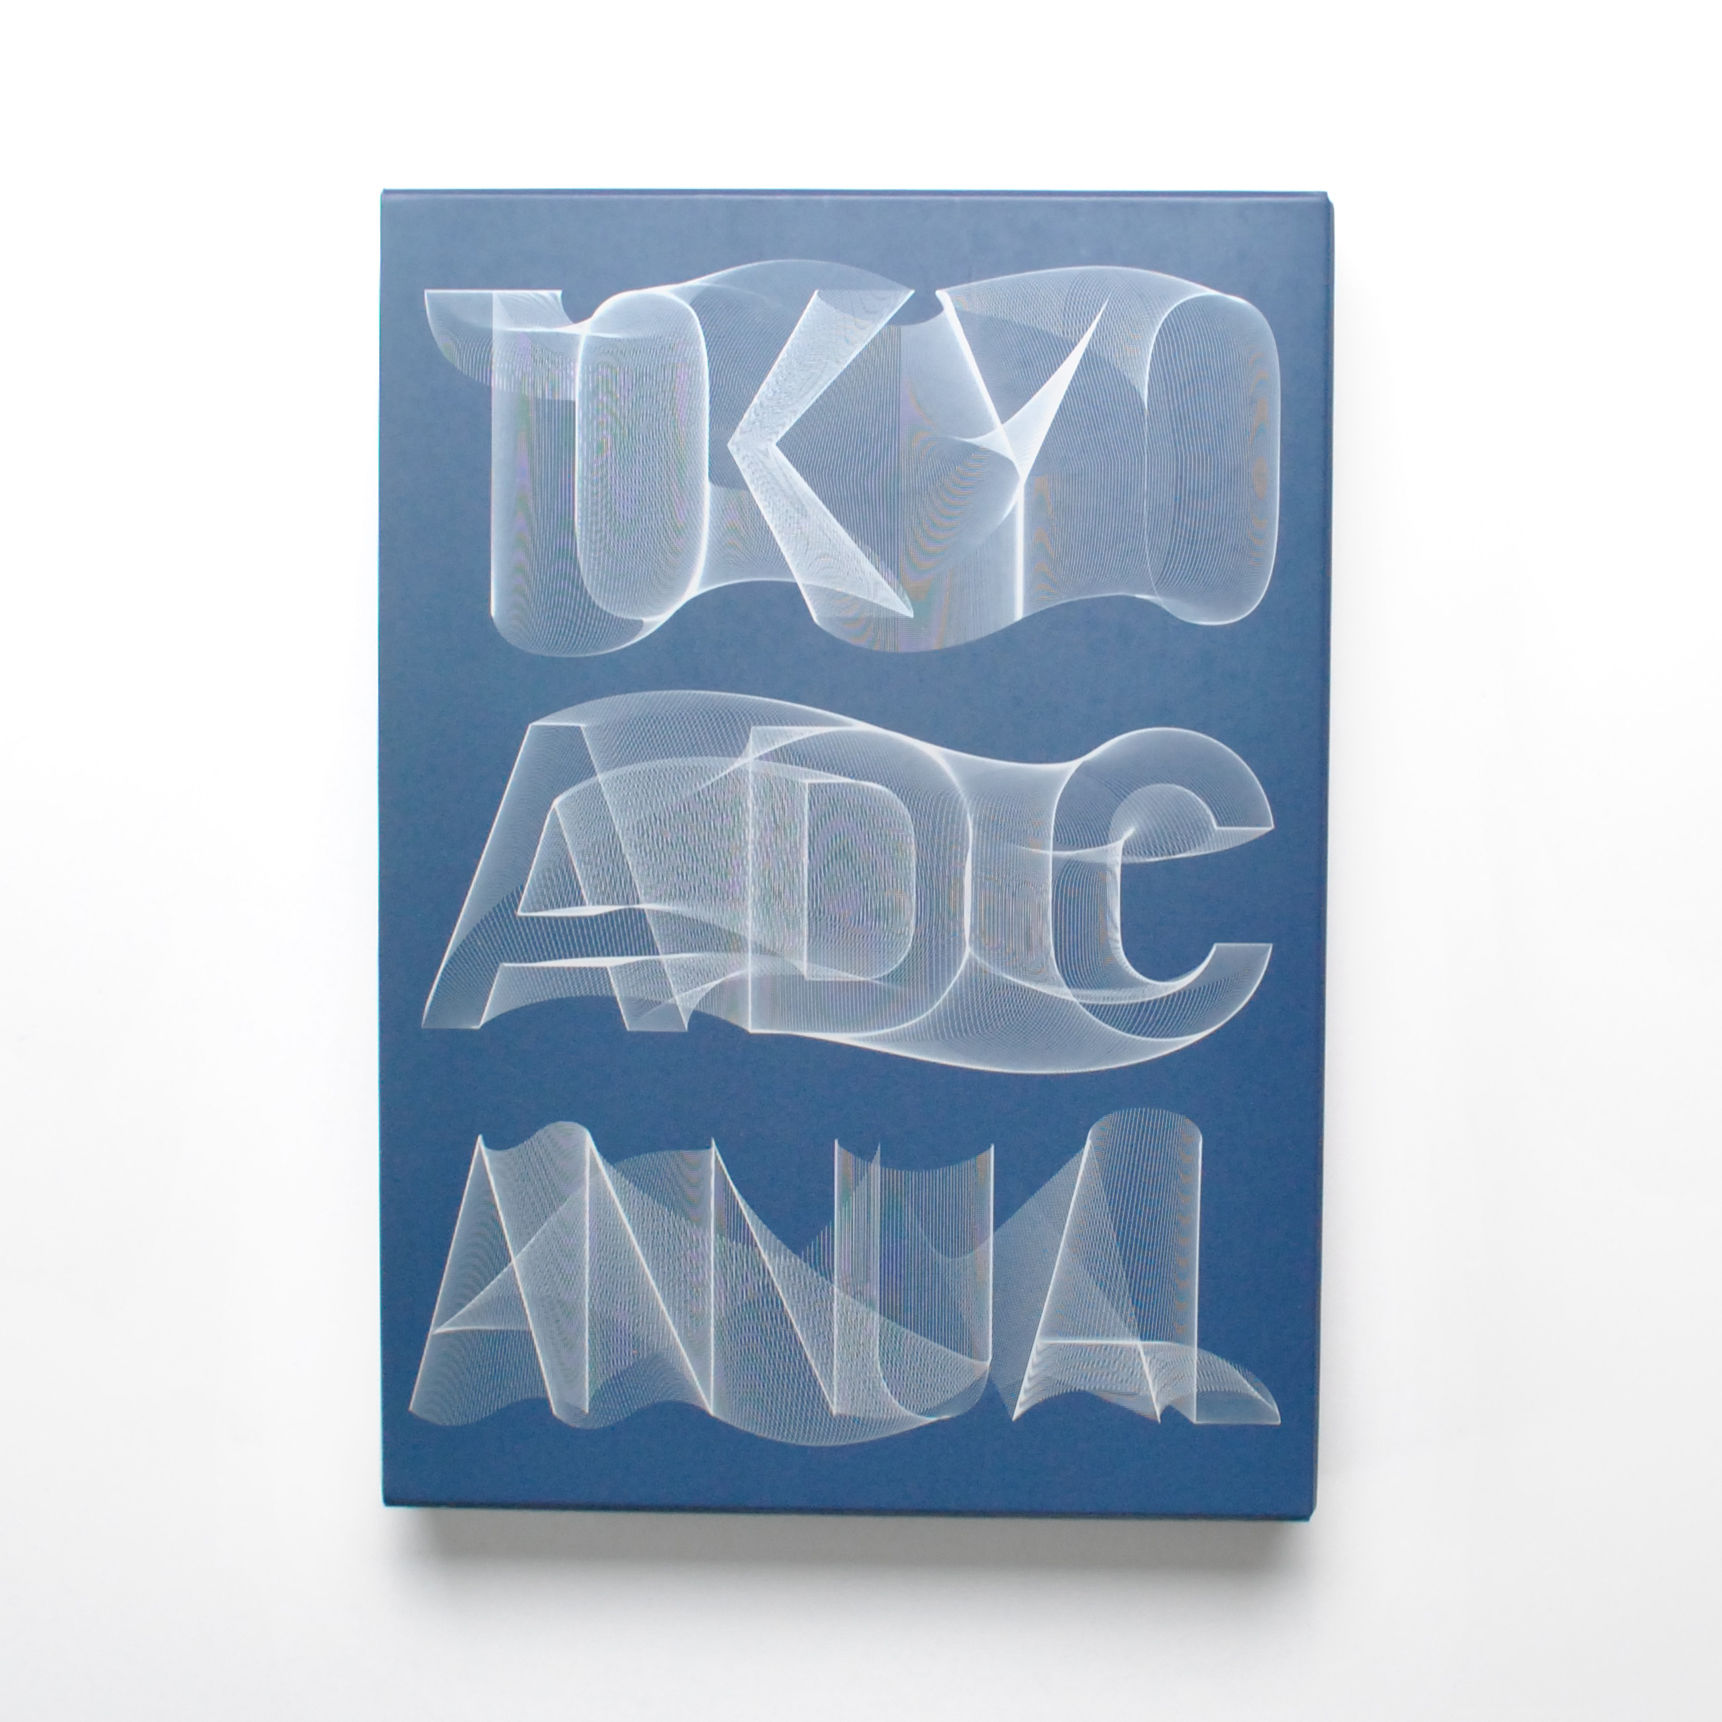 TOKYO ART DIRECTORS CLUB ANNUAL 2010